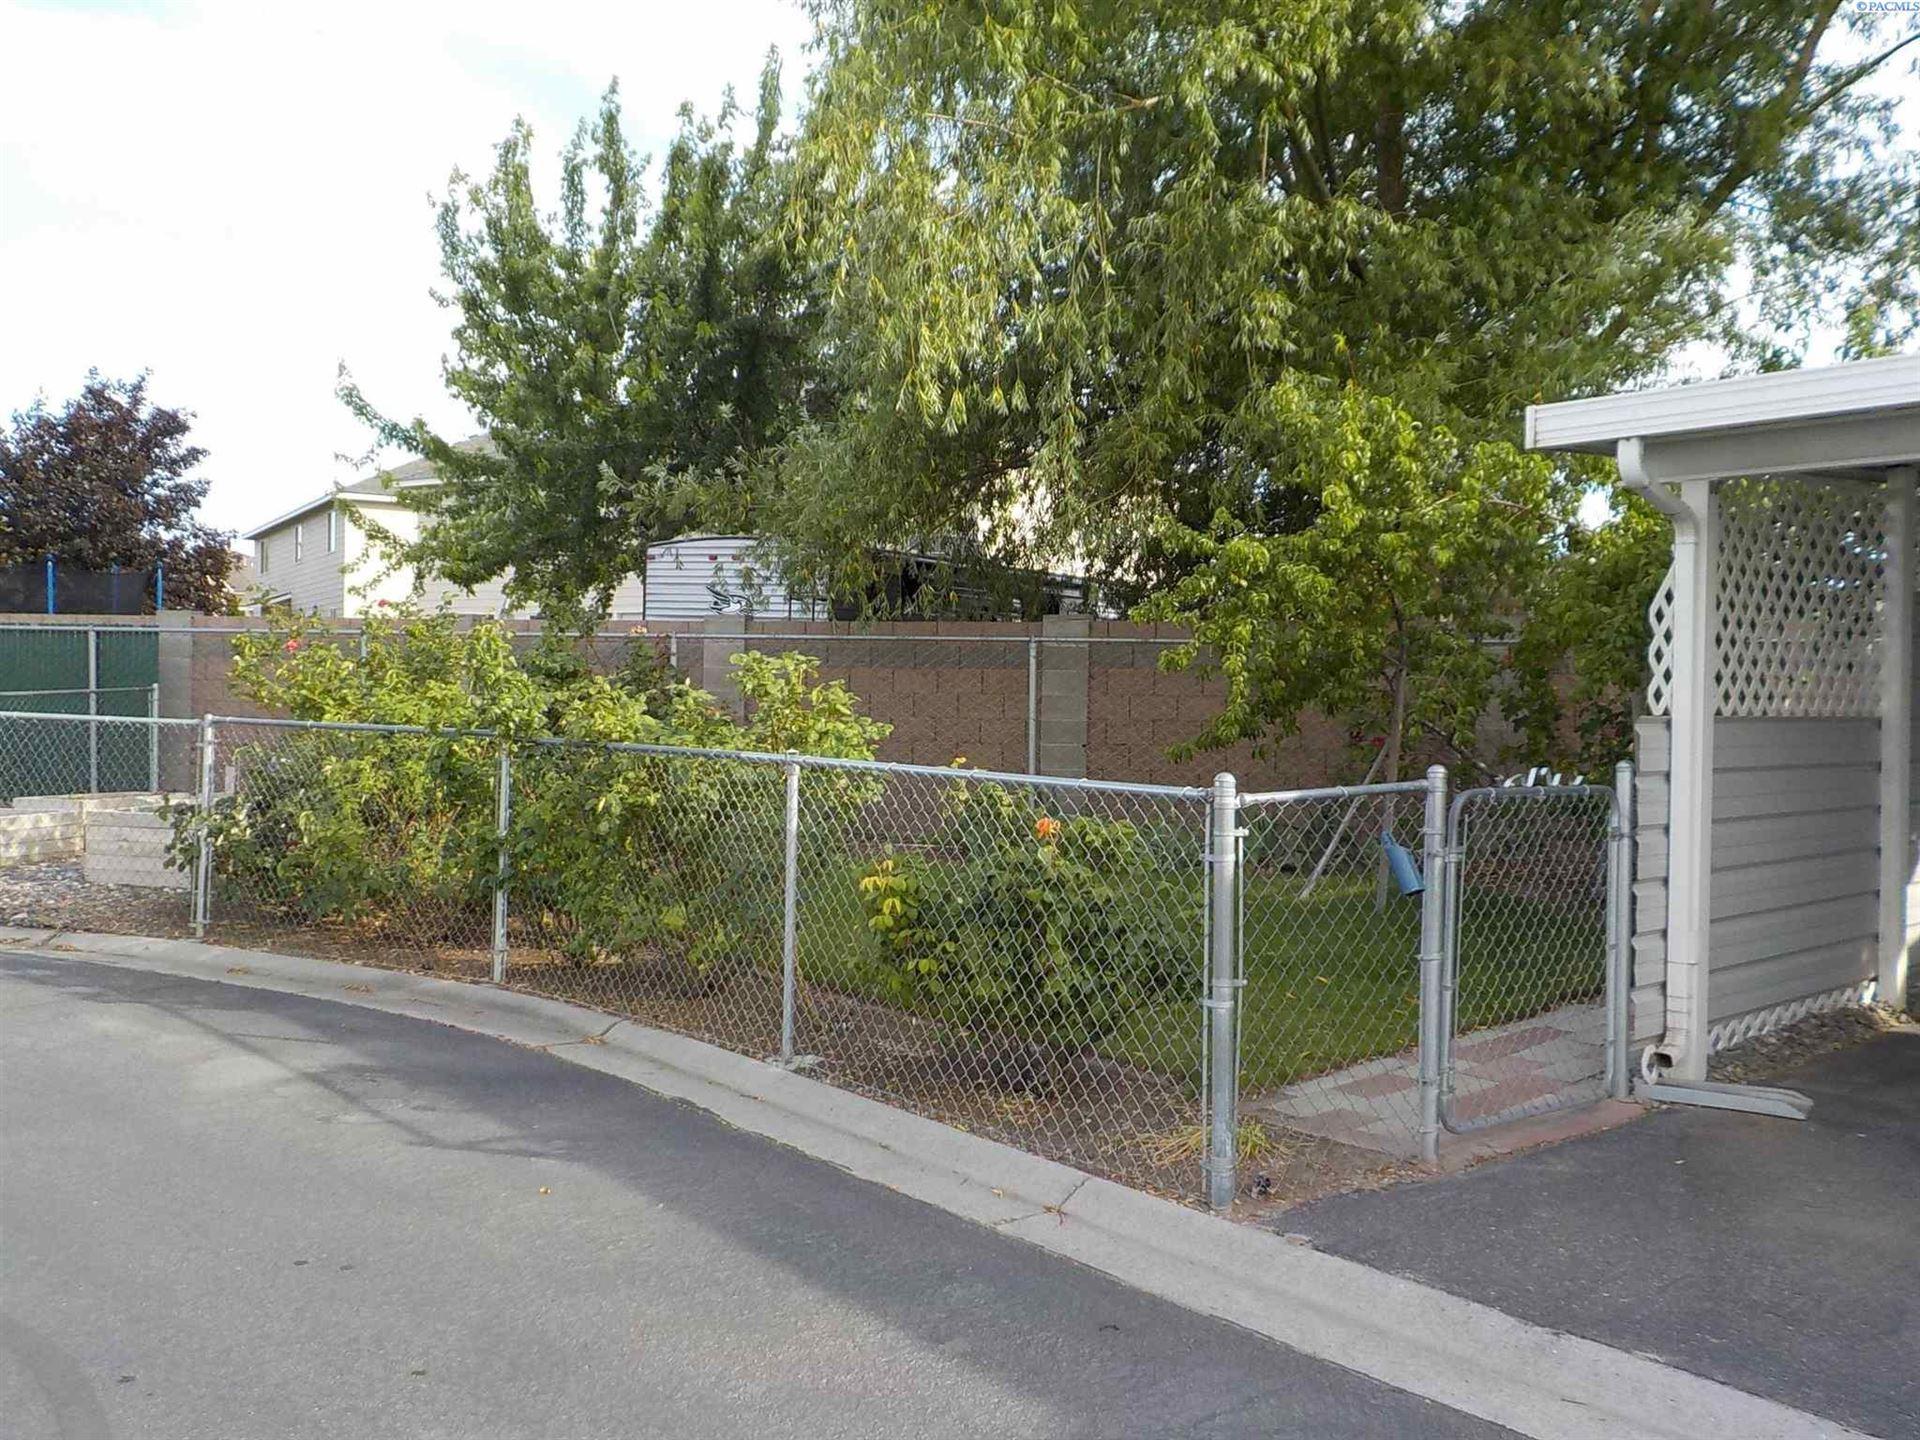 Photo of 7901 W Clearwater Avenue unit 20, Kennewick, WA 99336 (MLS # 254345)